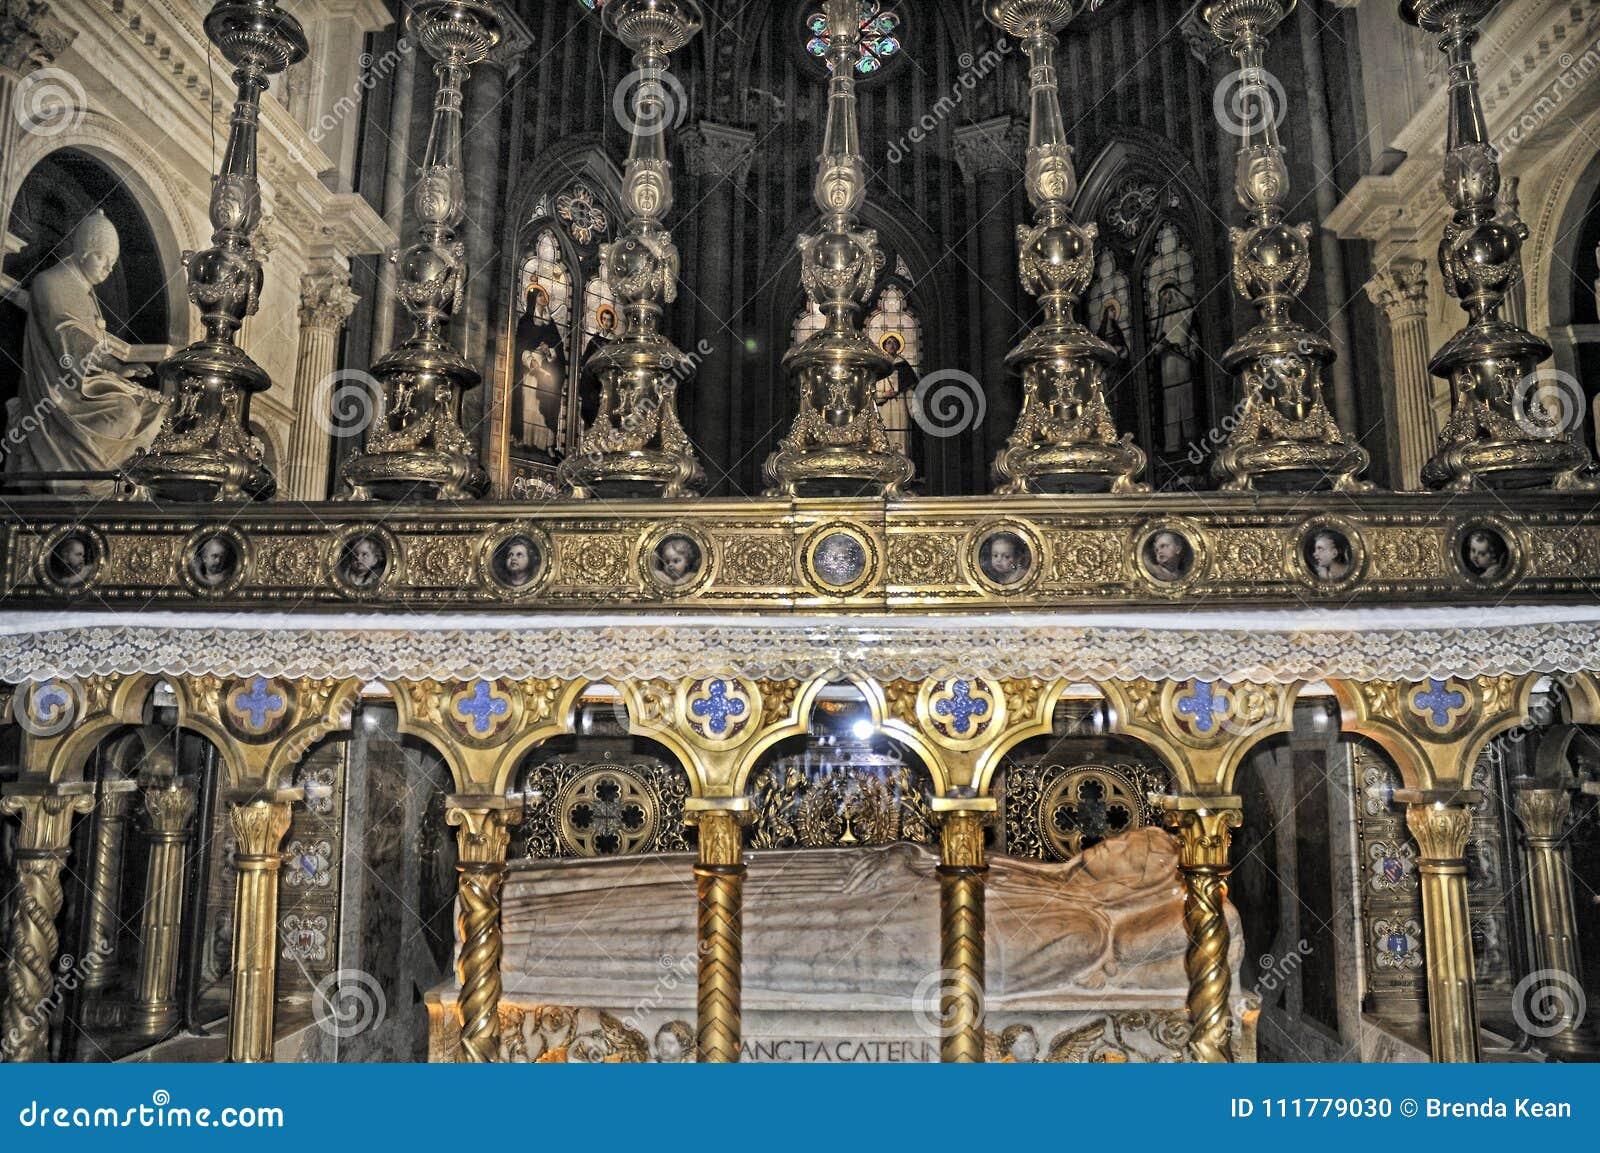 The Altar of the church of Santa maria Sopra Minerva in Rome